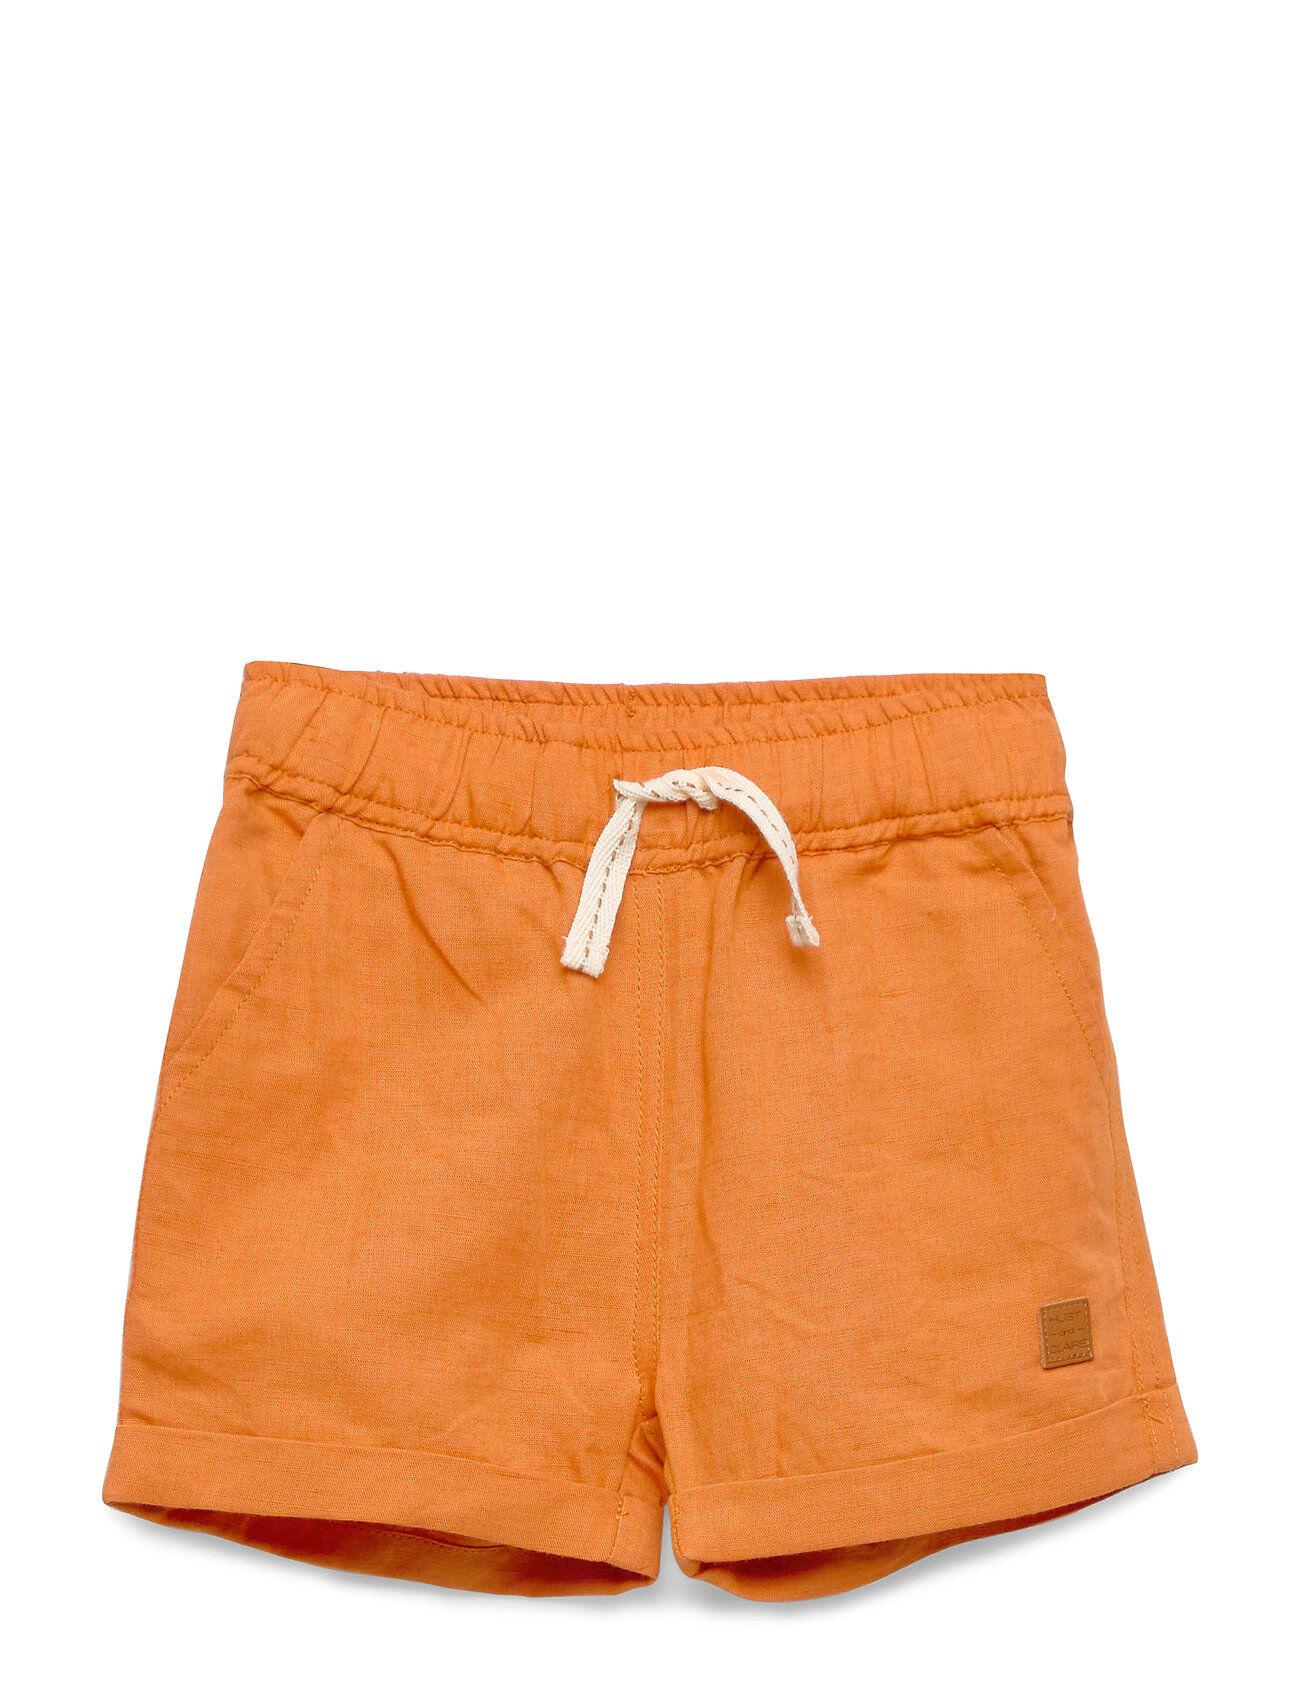 Hust & Claire Hakon - Shorts Shortsit Oranssi Hust & Claire